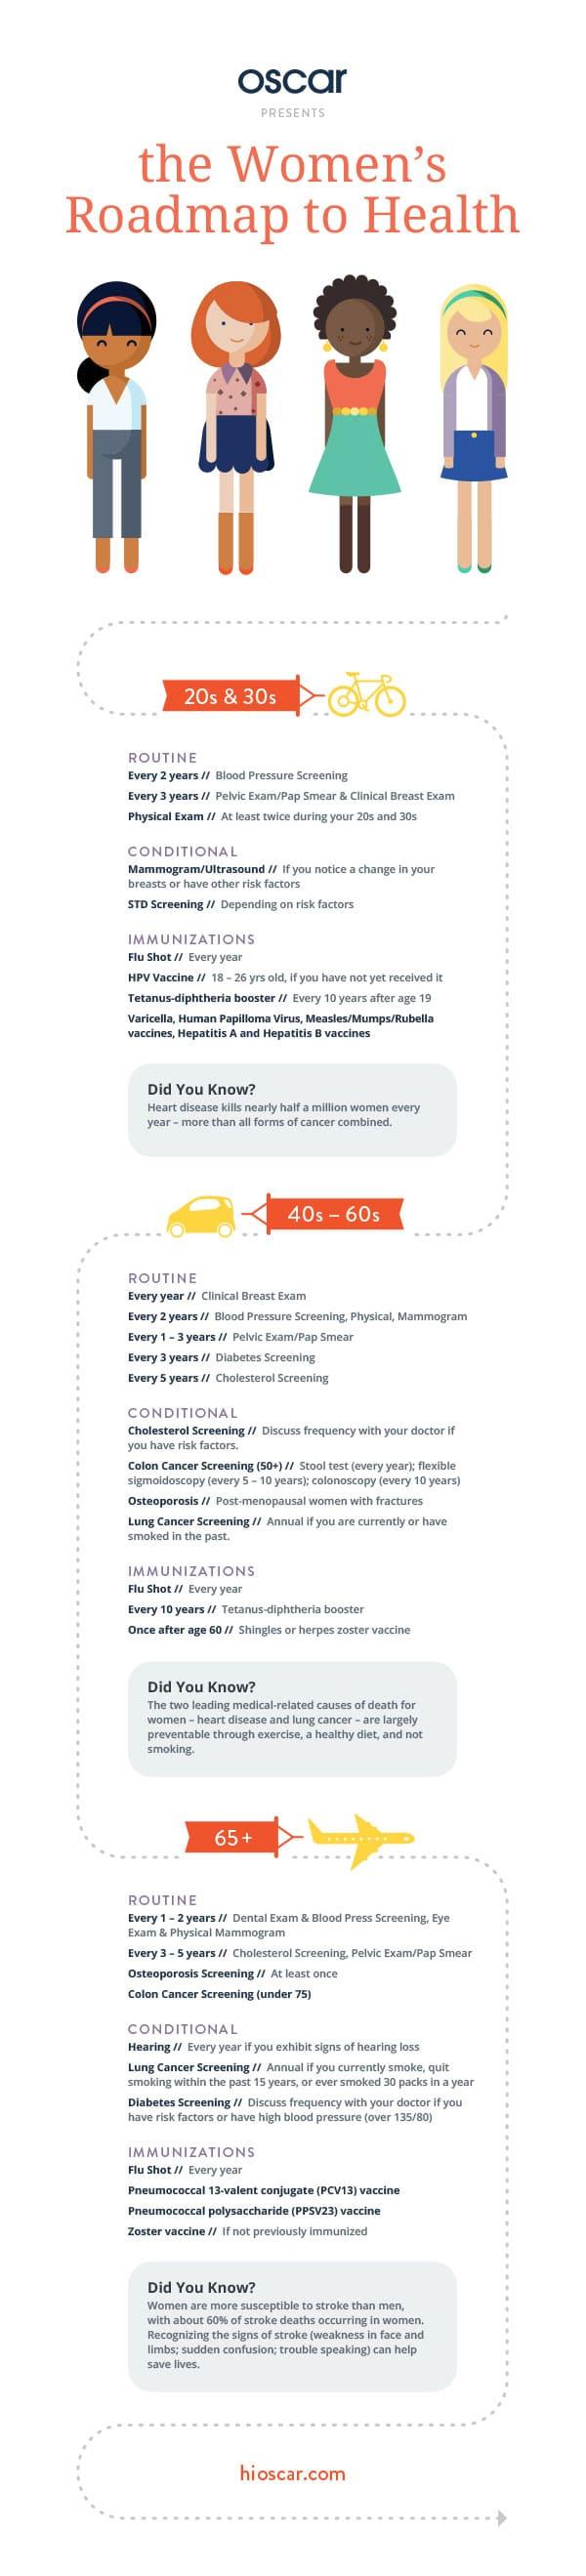 Baby Boomer Women | Women Over 50 | Roadmap to Health Infographic